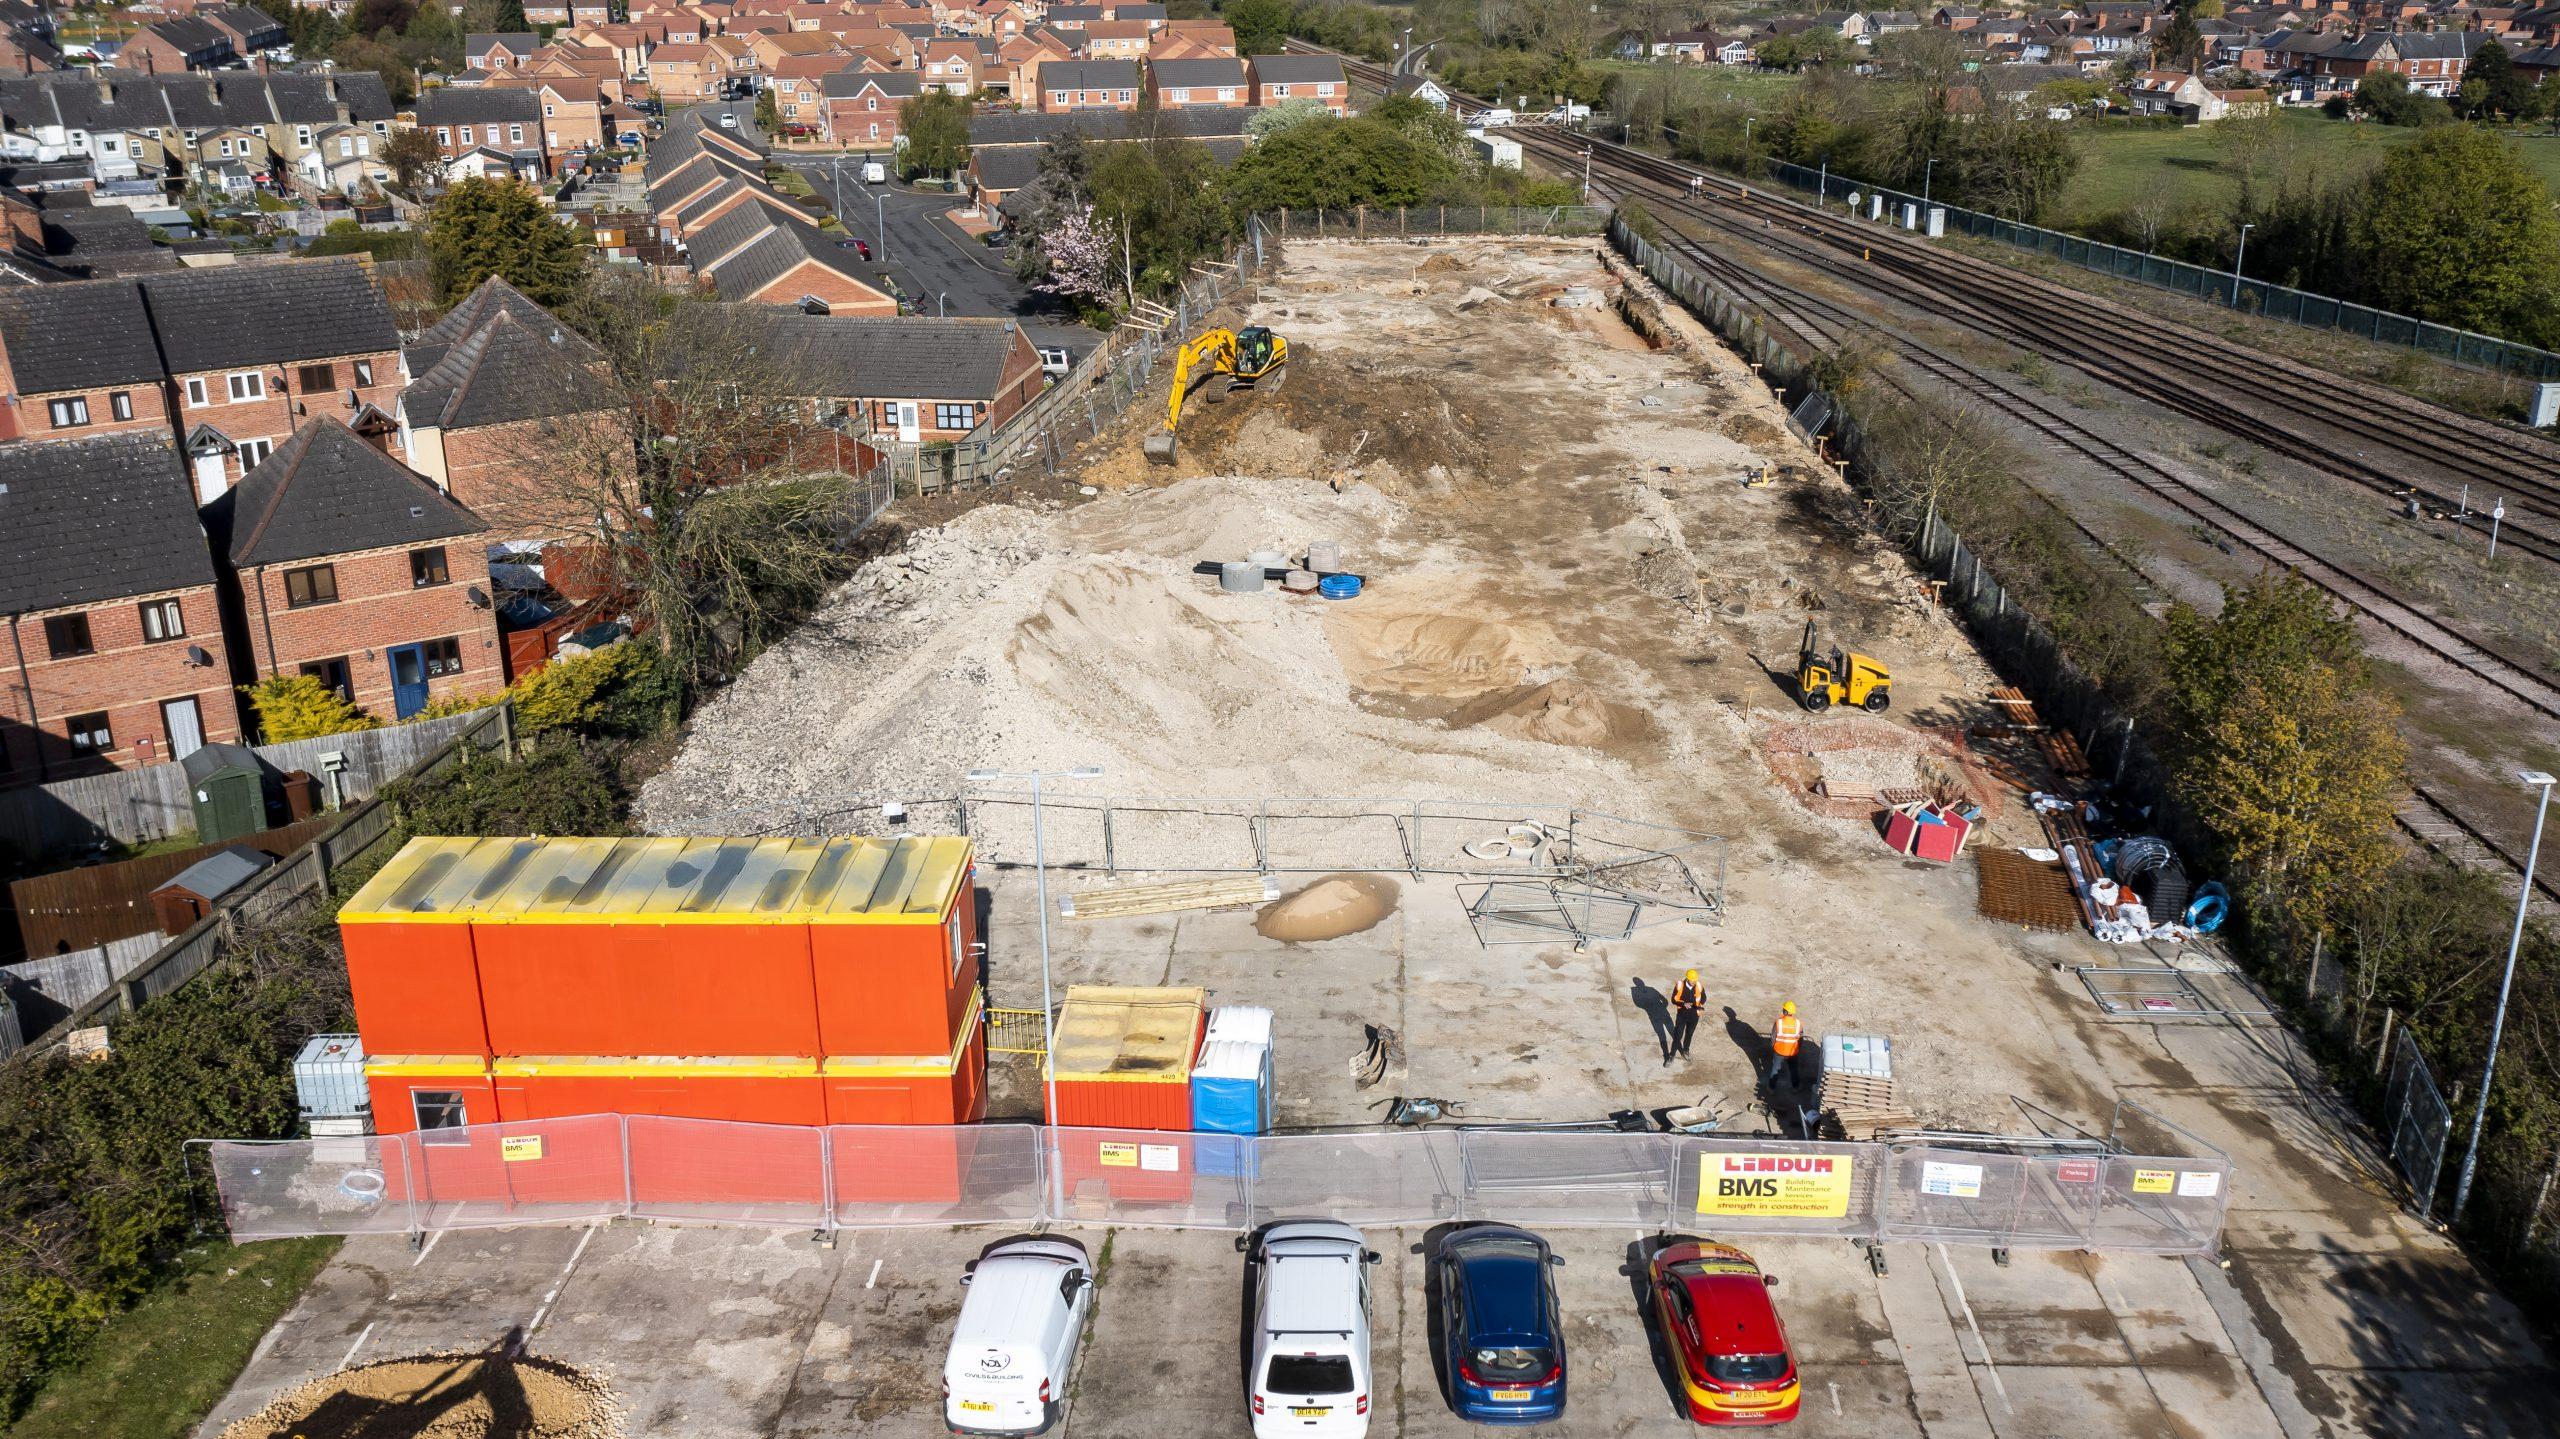 Work begins on 12 new homes in Sleaford